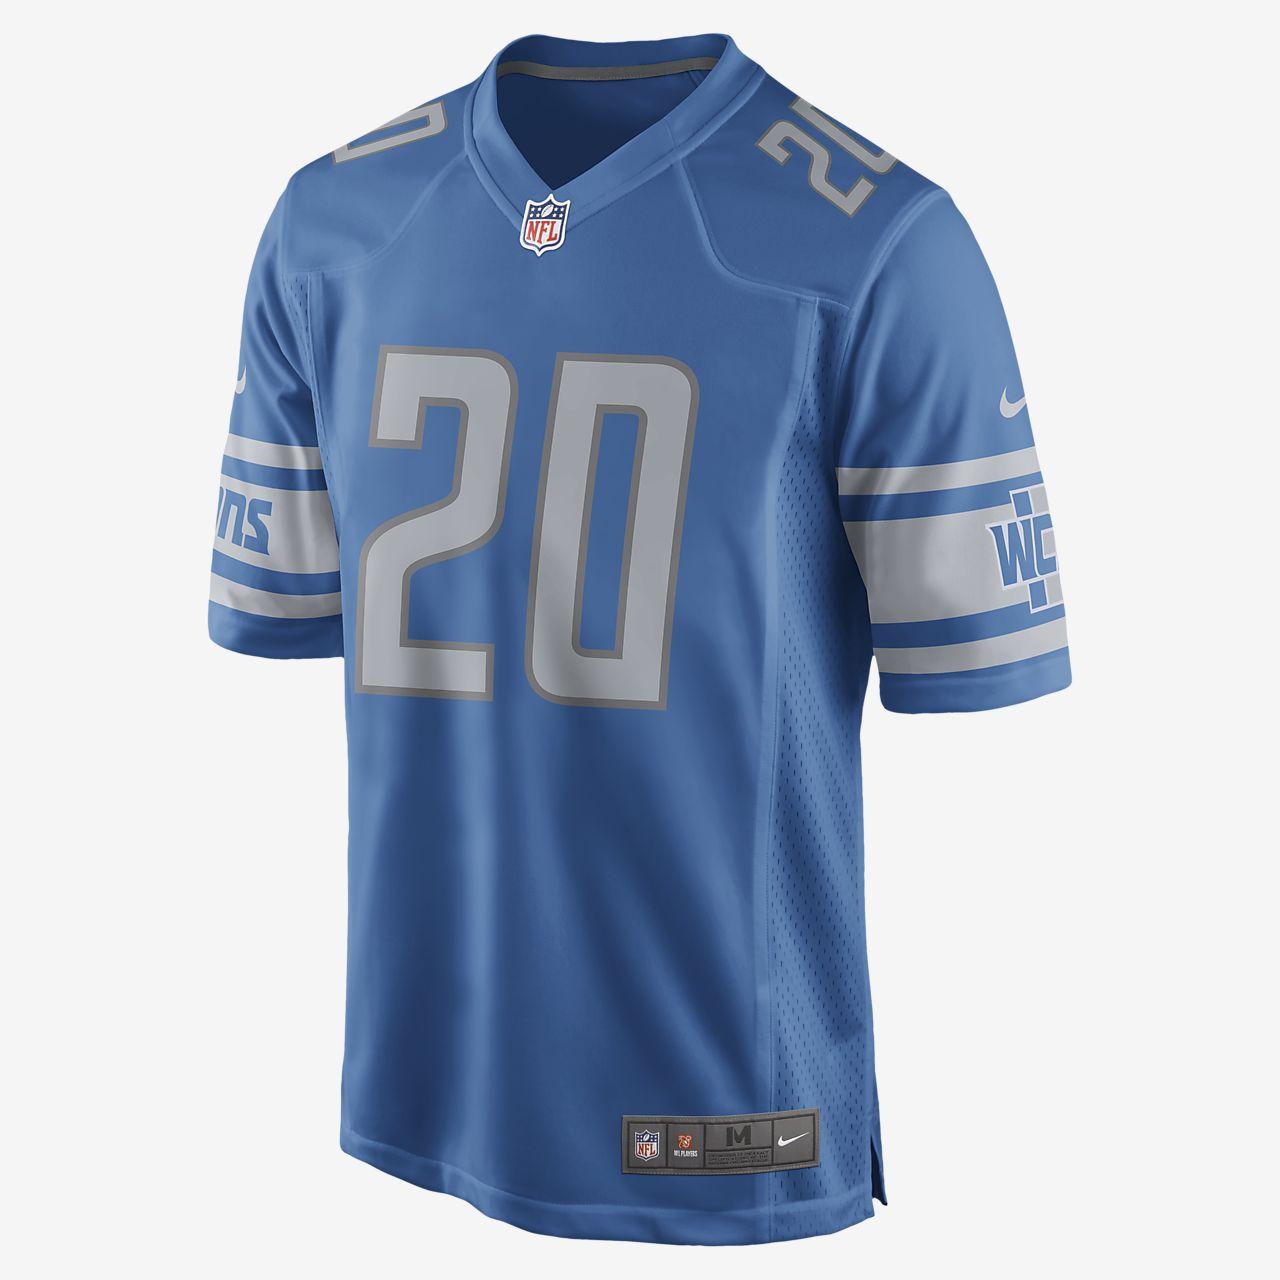 NFL Detroit Lions (Barry Sanders) Men's Football Game Jersey